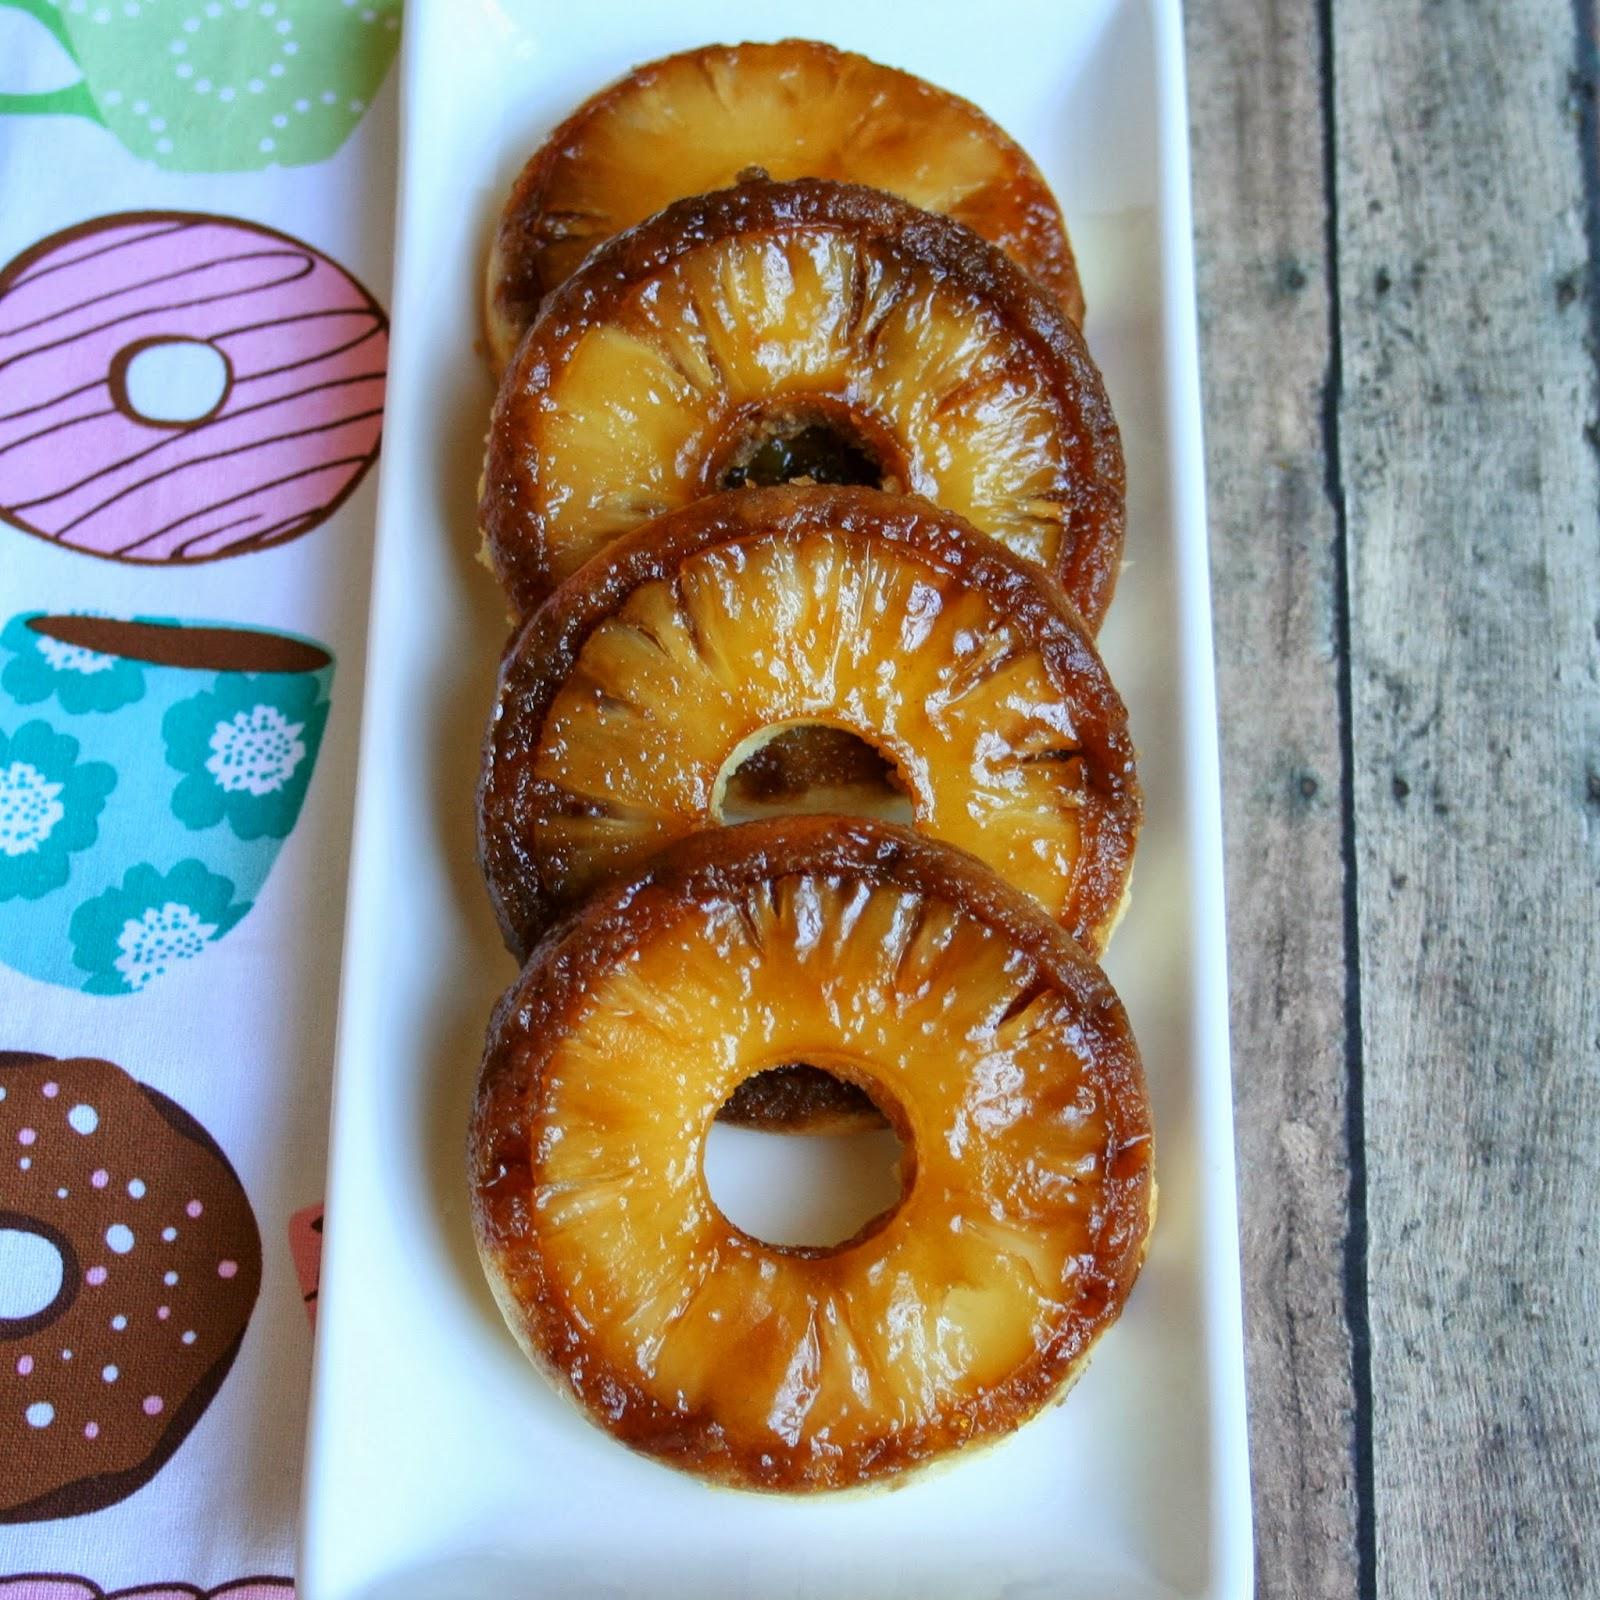 Pineapple Upside Down Cake Doughnuts